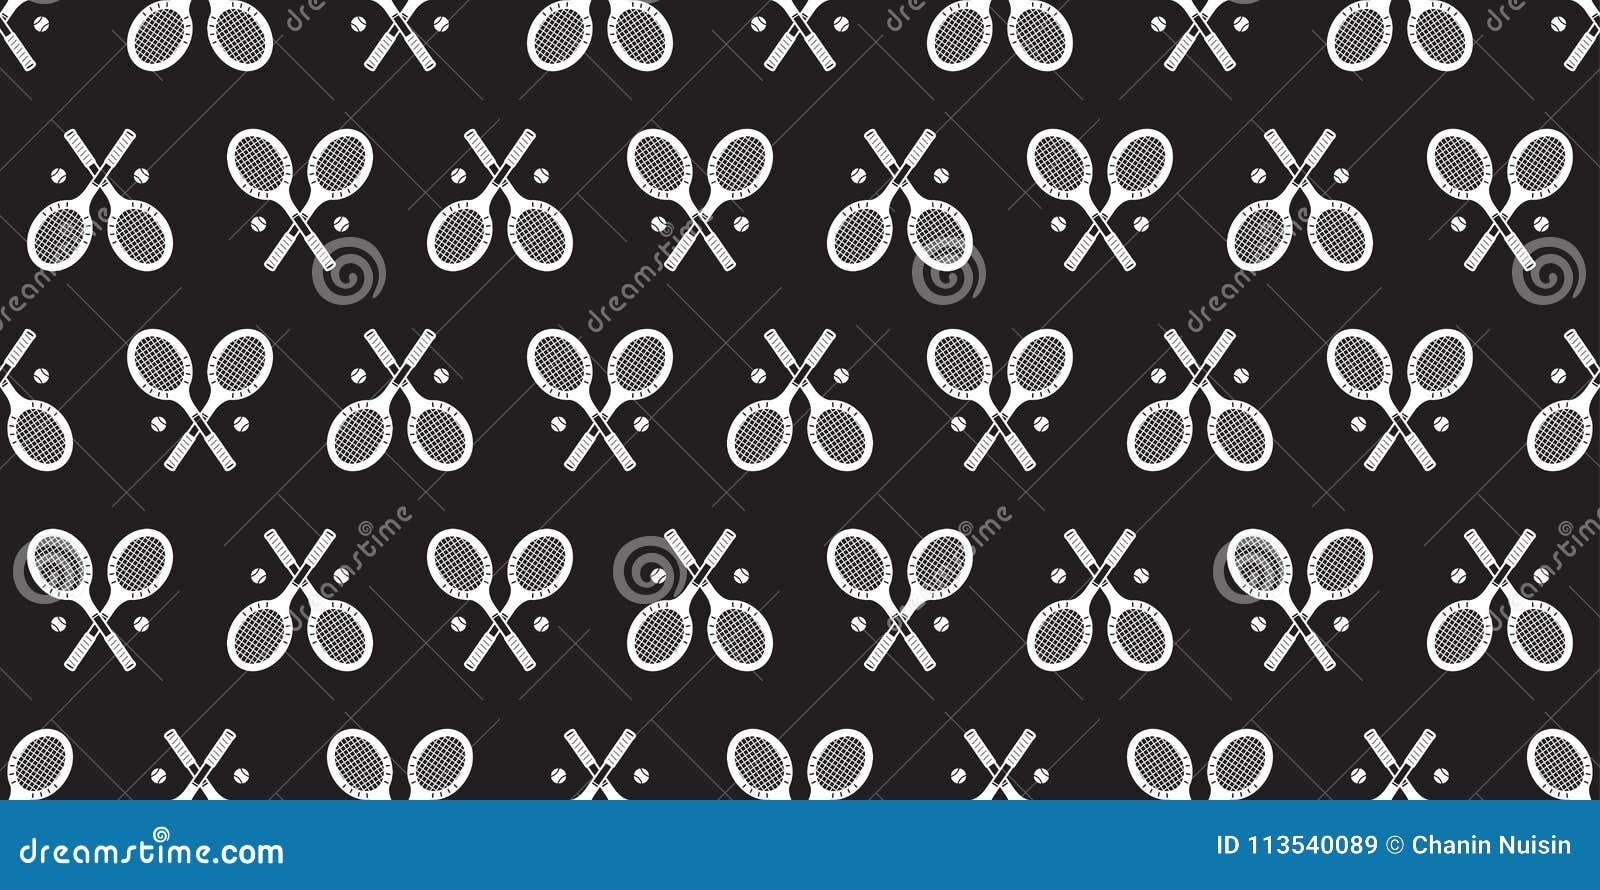 Pattern For Sport Wallpaper: Tennis Racket Seamless Pattern Vector Ball Badminton